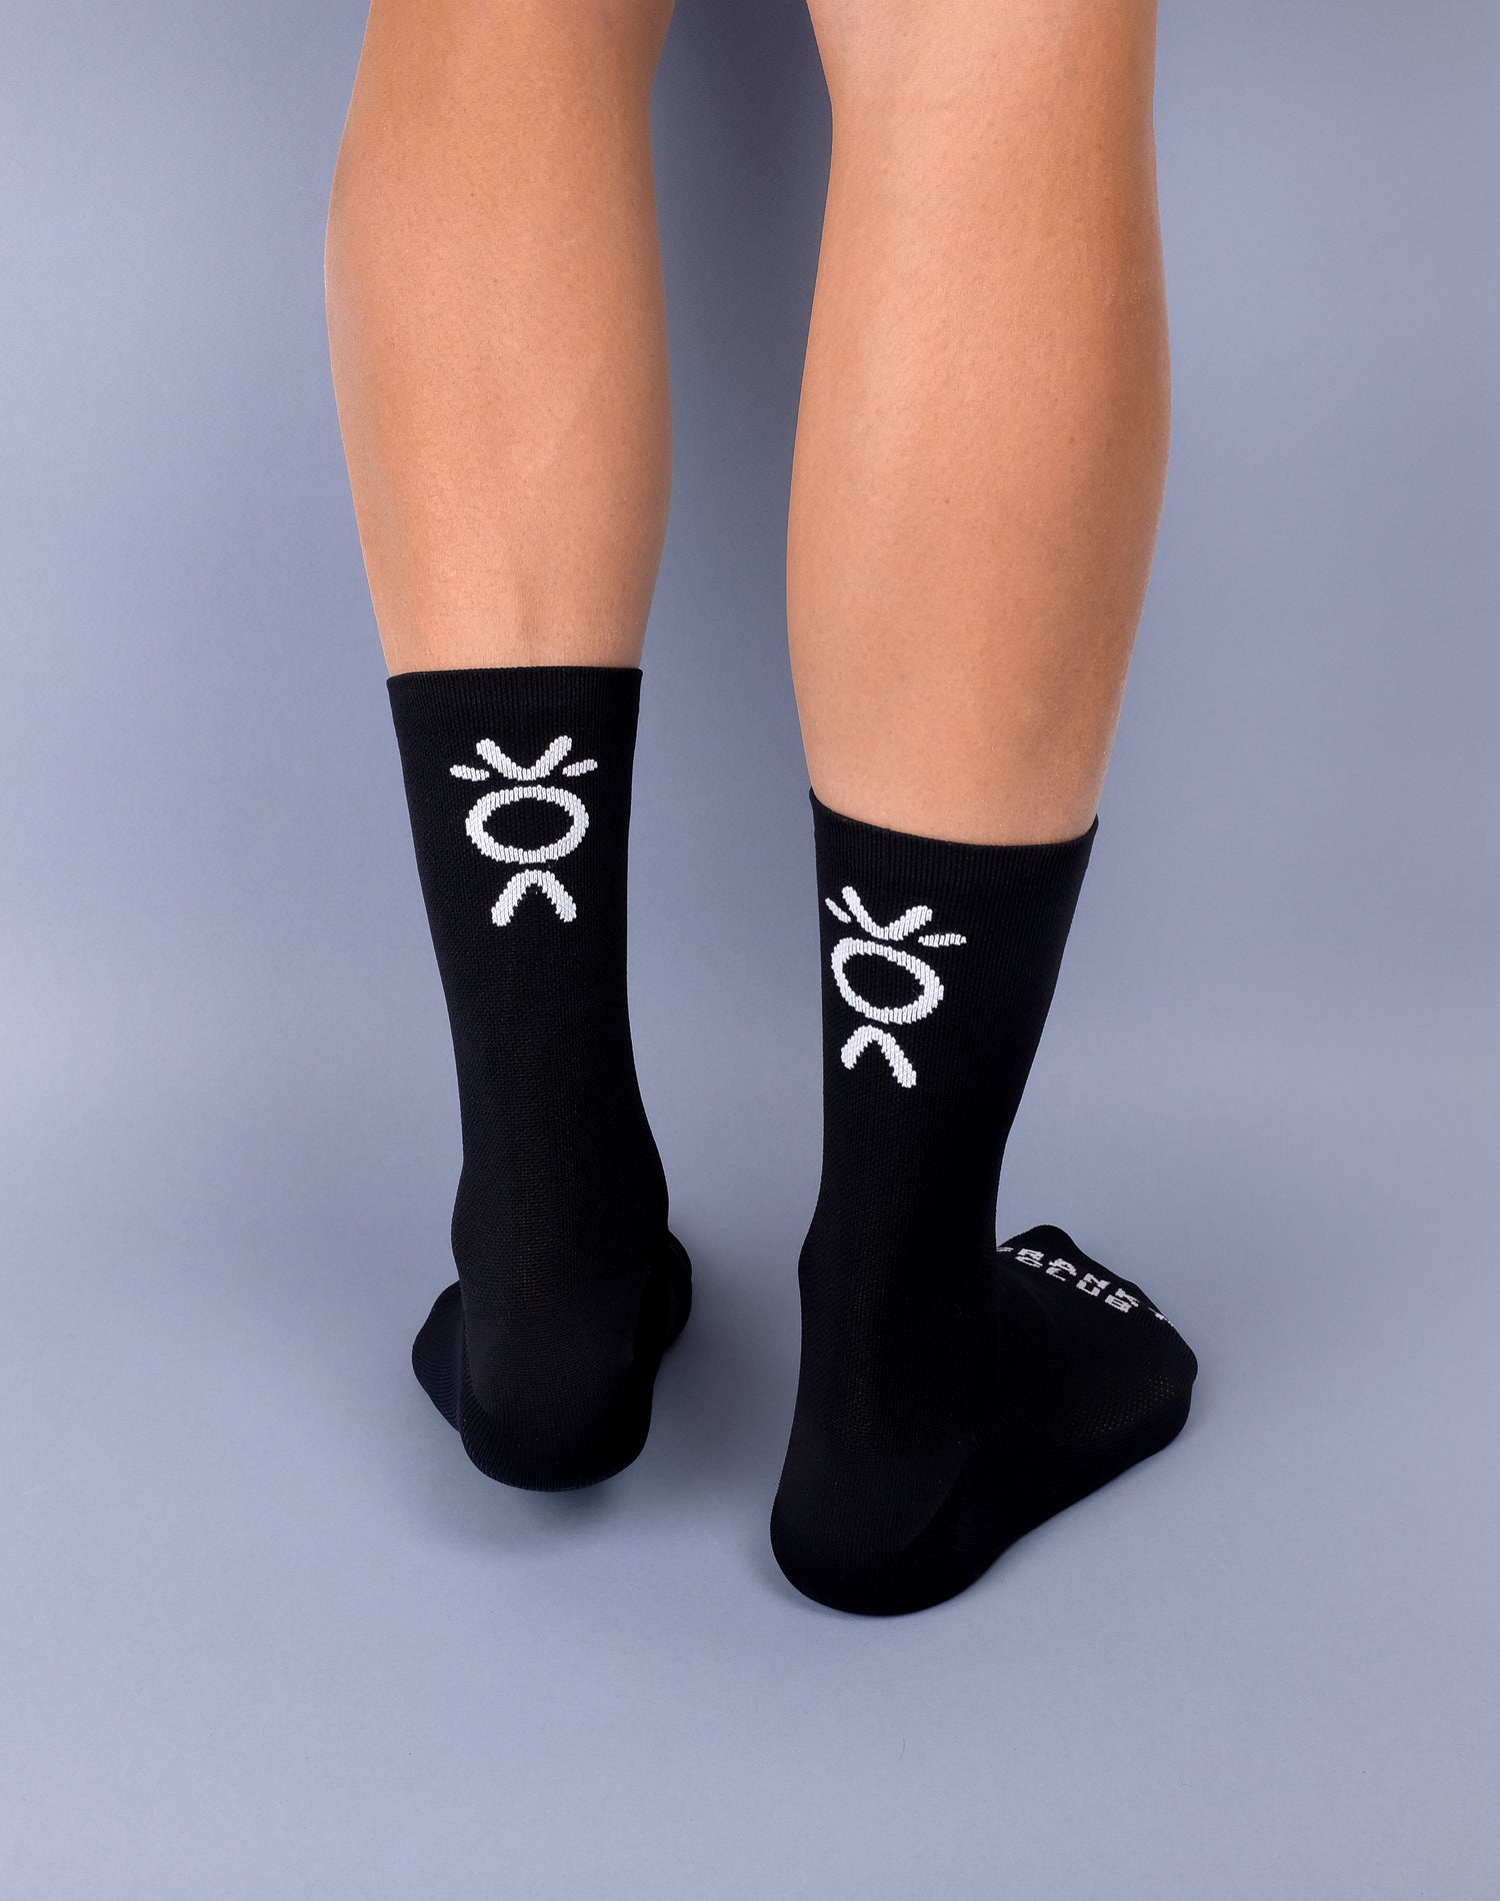 Image of Unhappy Socks - Black